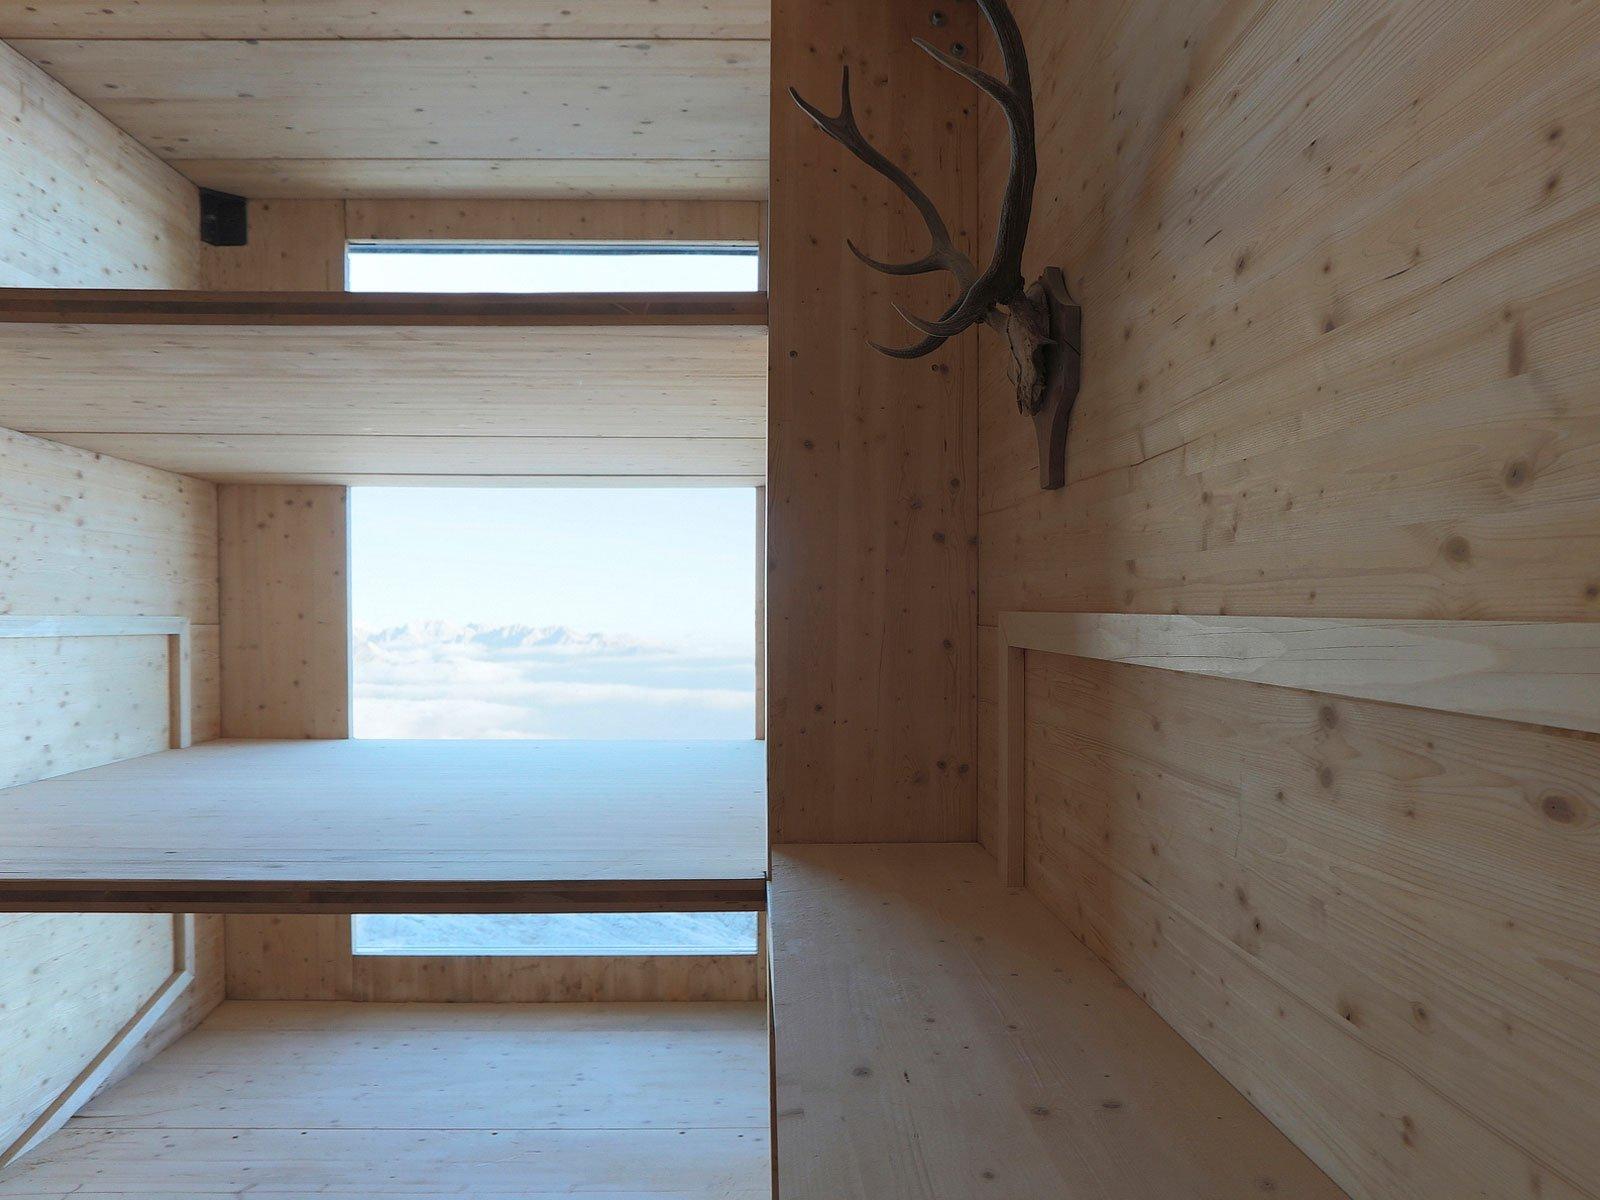 winter-cabin-kanin_ofis_fotojanez-martincic_23-2_web